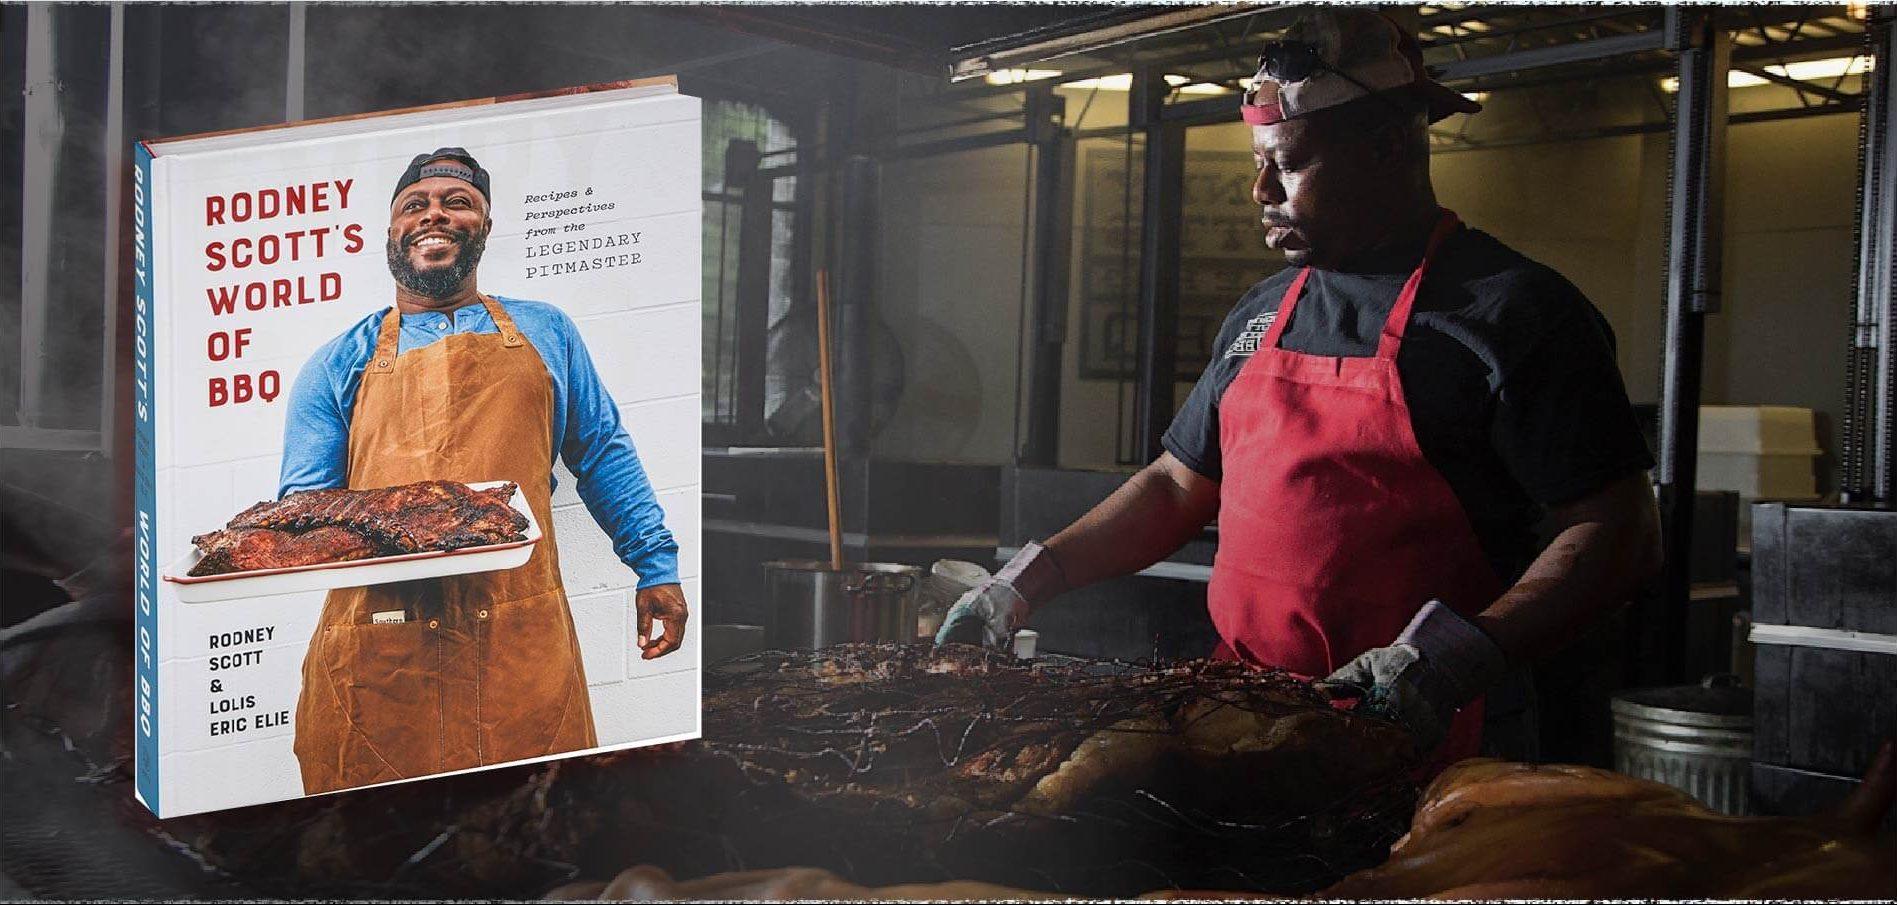 Rodney Scott's with his book Rodney Scott's World of BBQ